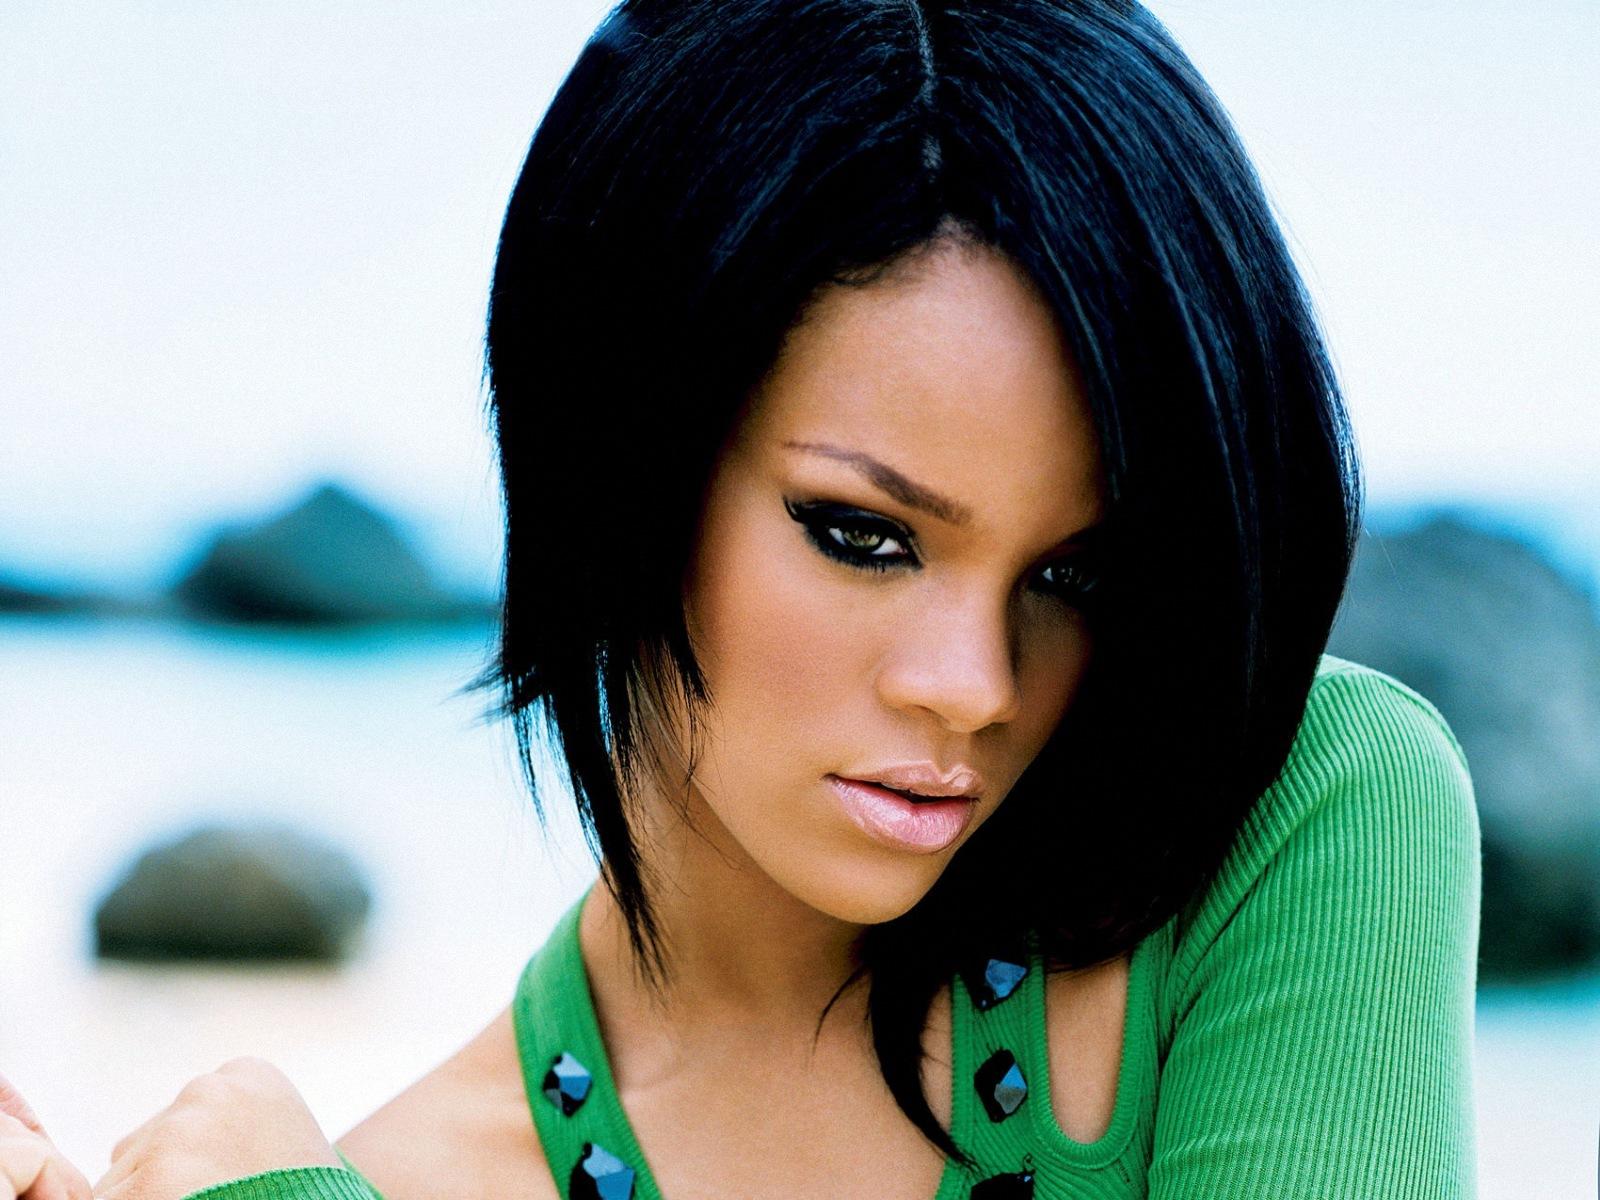 Rihanna: HD Rihanna Wallpaper-High Definition Wallpapers Stock